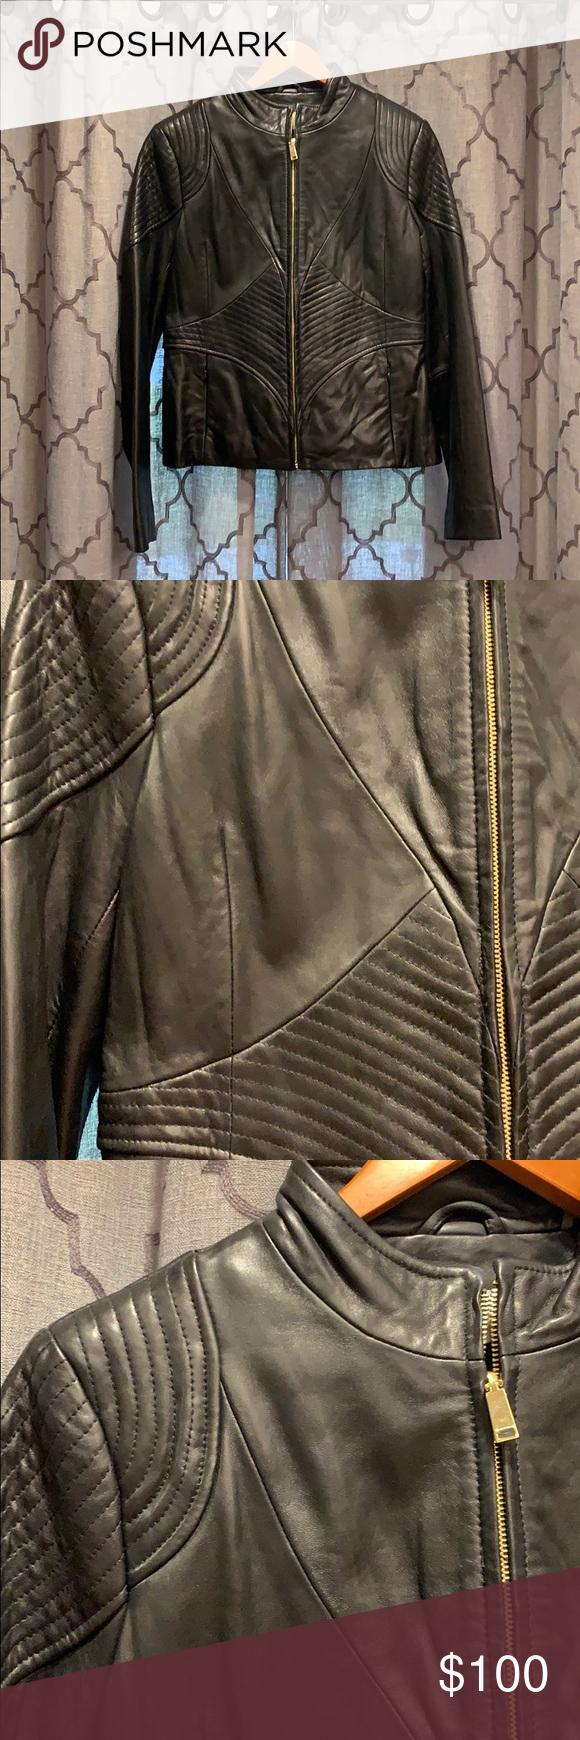 Women S T Tahari Leather Jacket Leather Jackets Women Leather Jacket Black Women [ 1740 x 580 Pixel ]